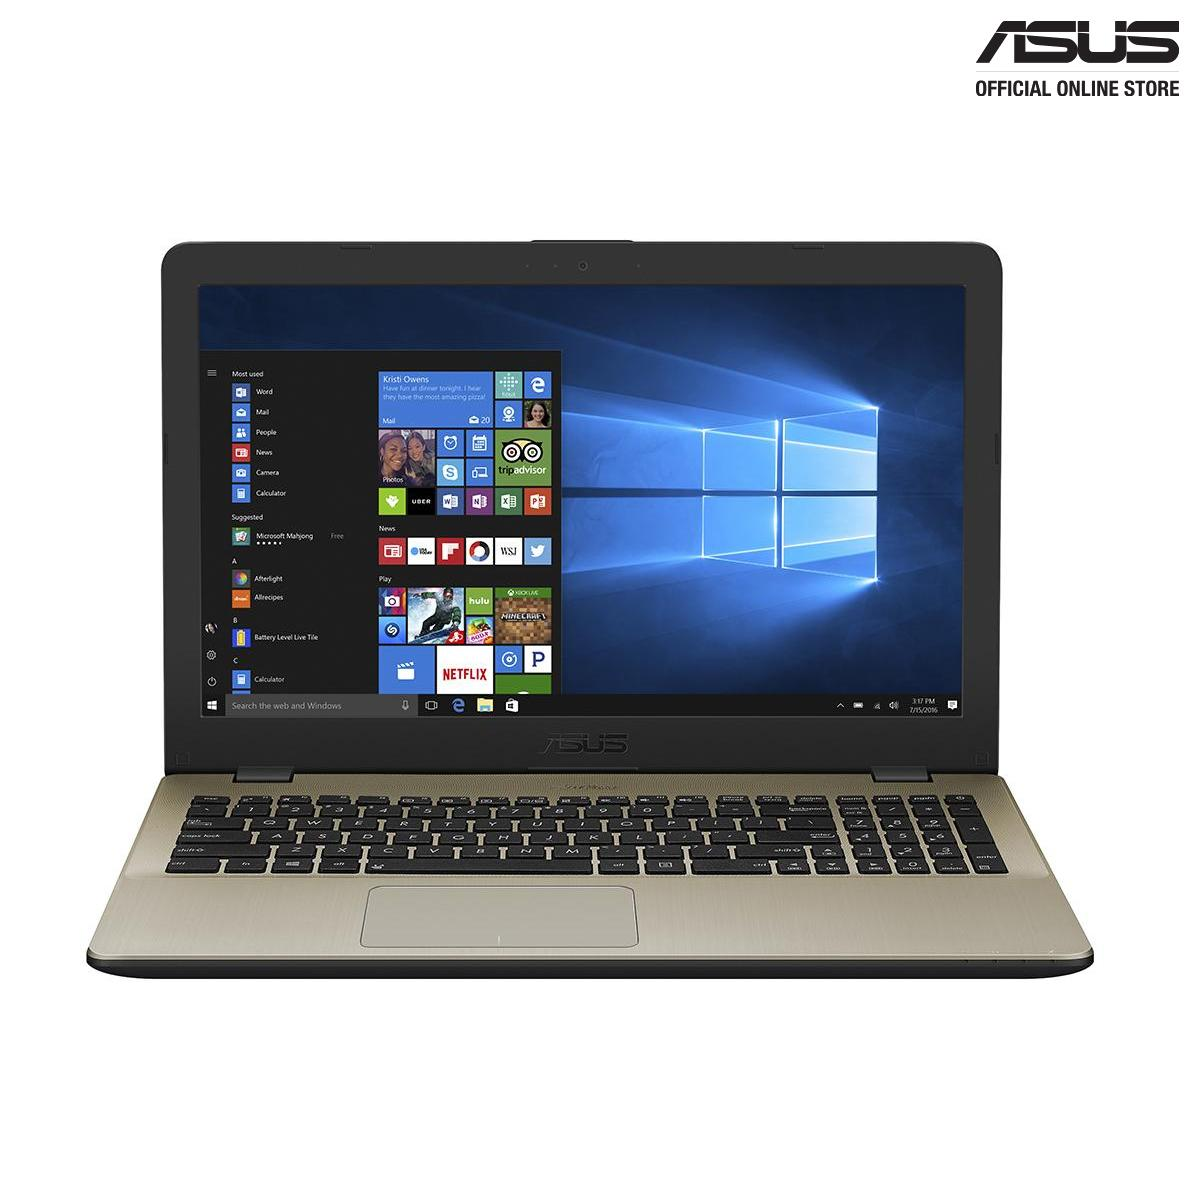 Asus VivoBook 15 X542UR-DM536T